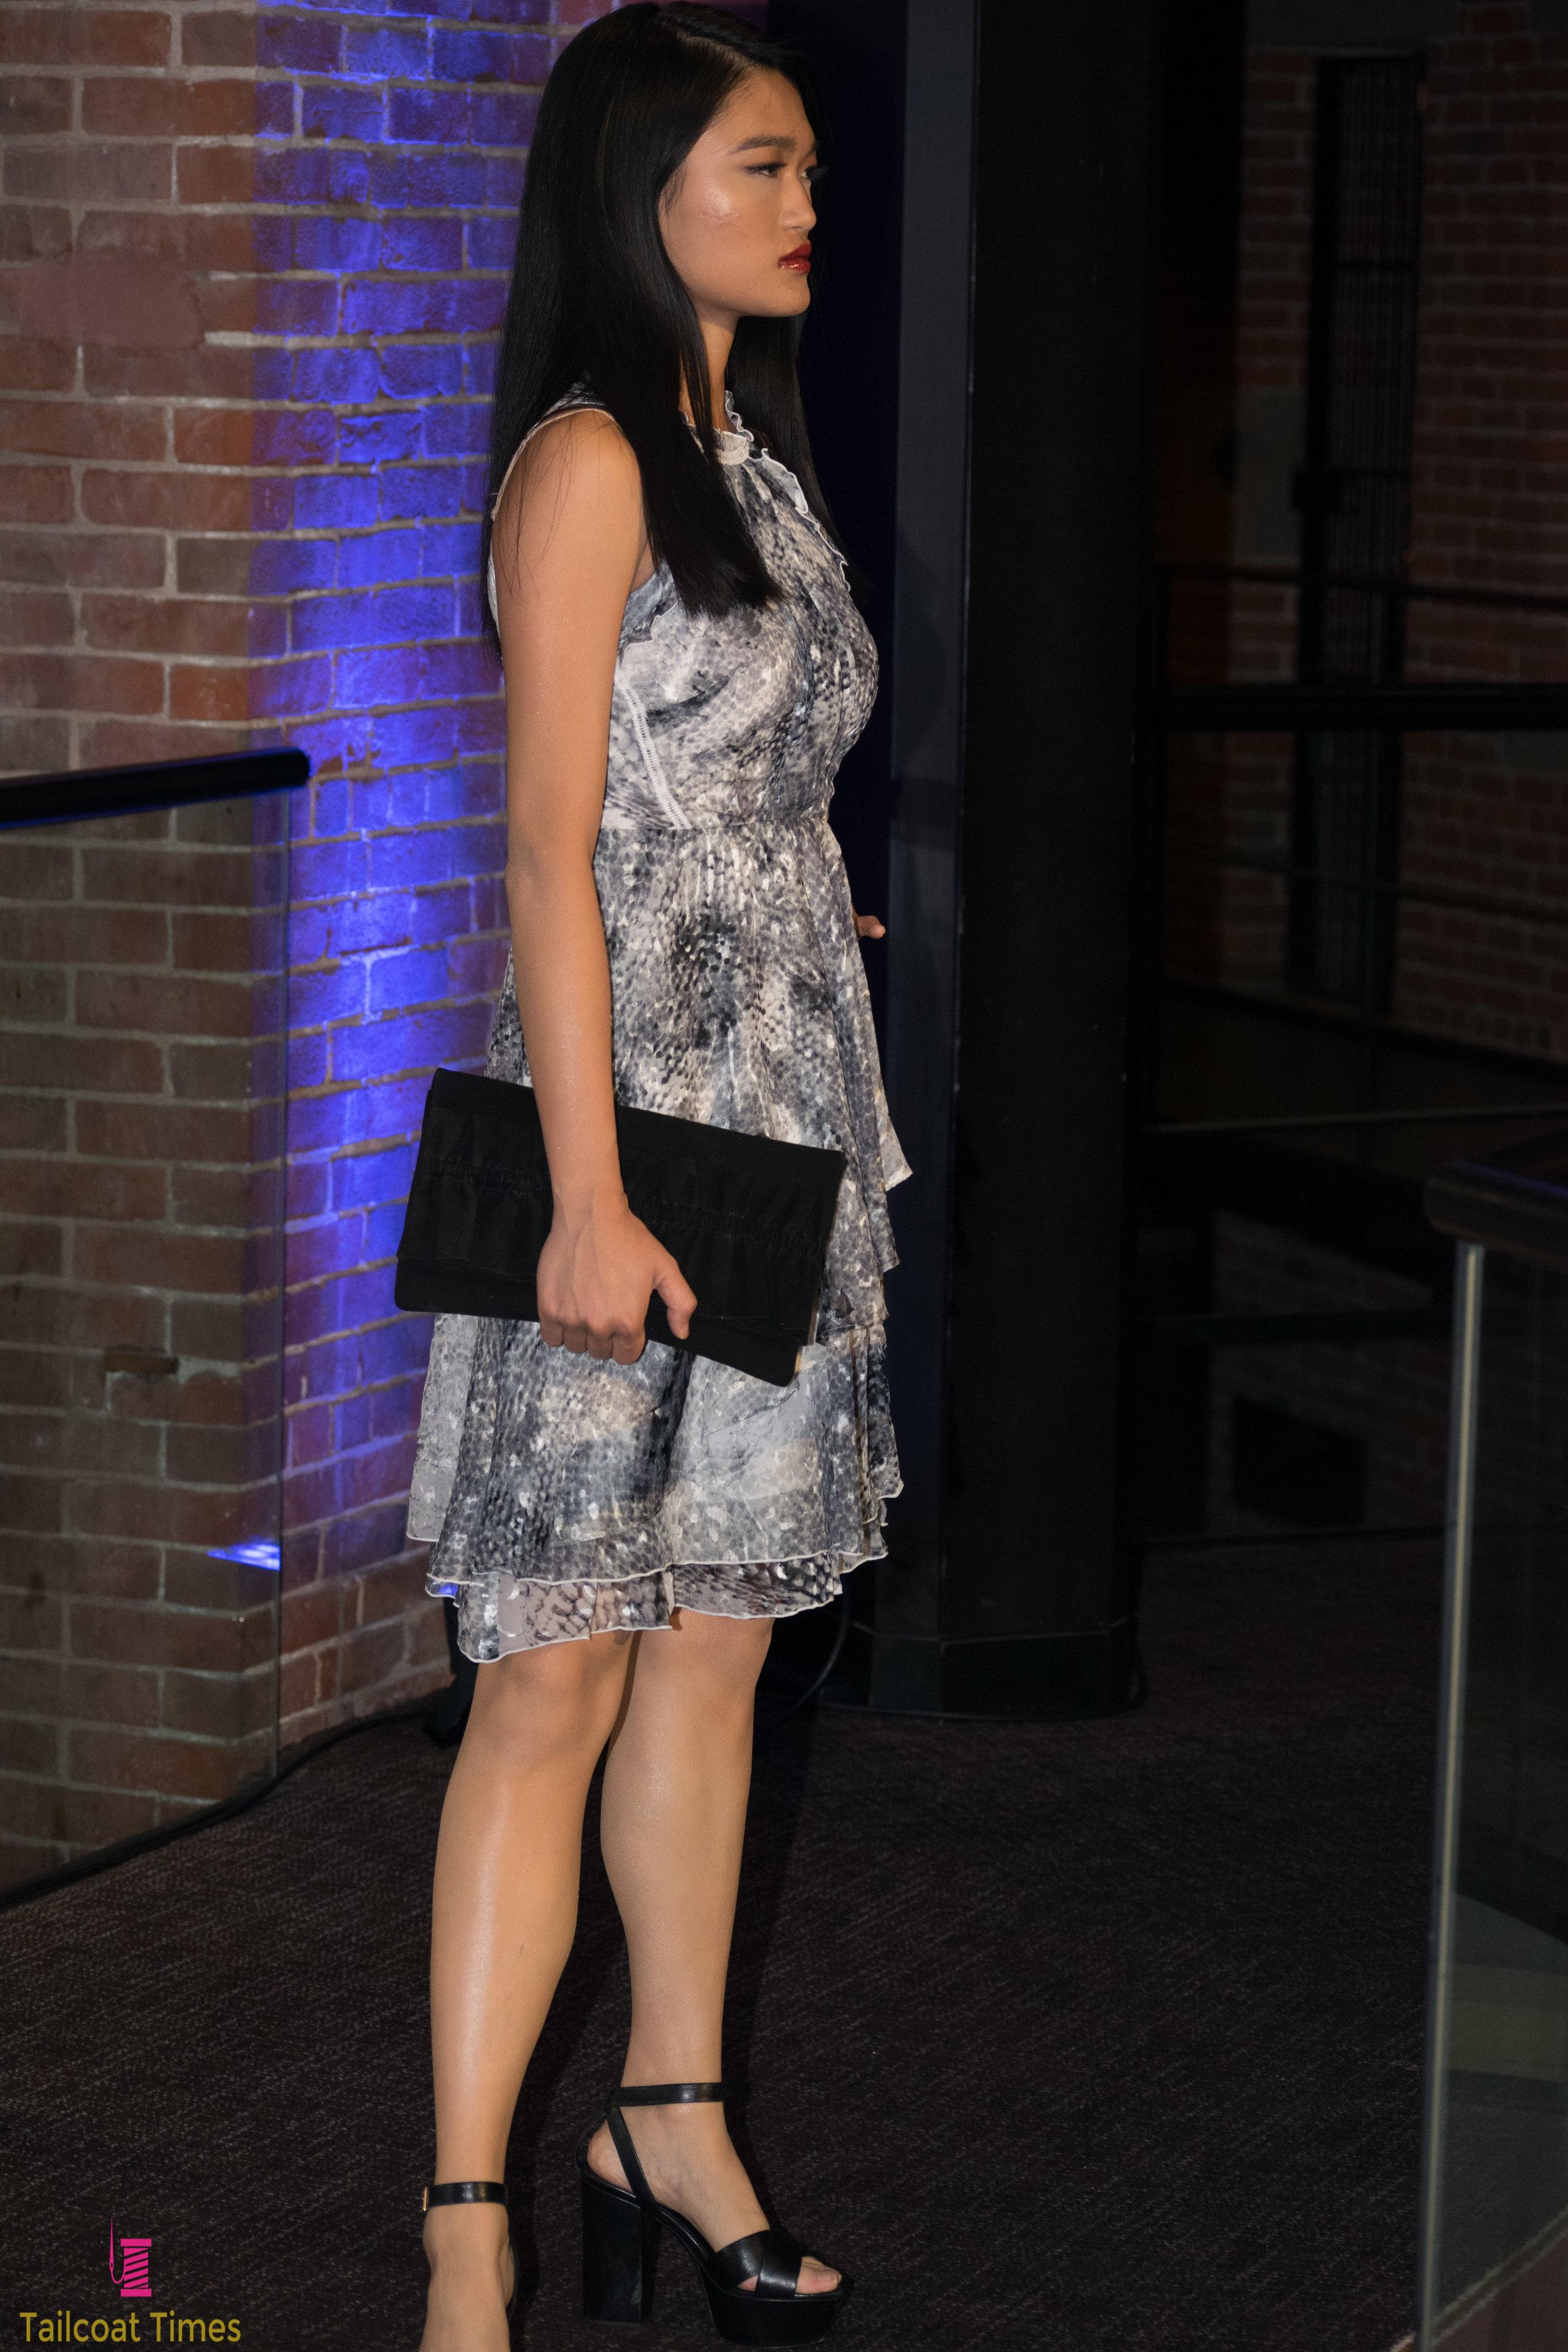 FashionablyLate-REISS-Tailcoat Times-2.jpg